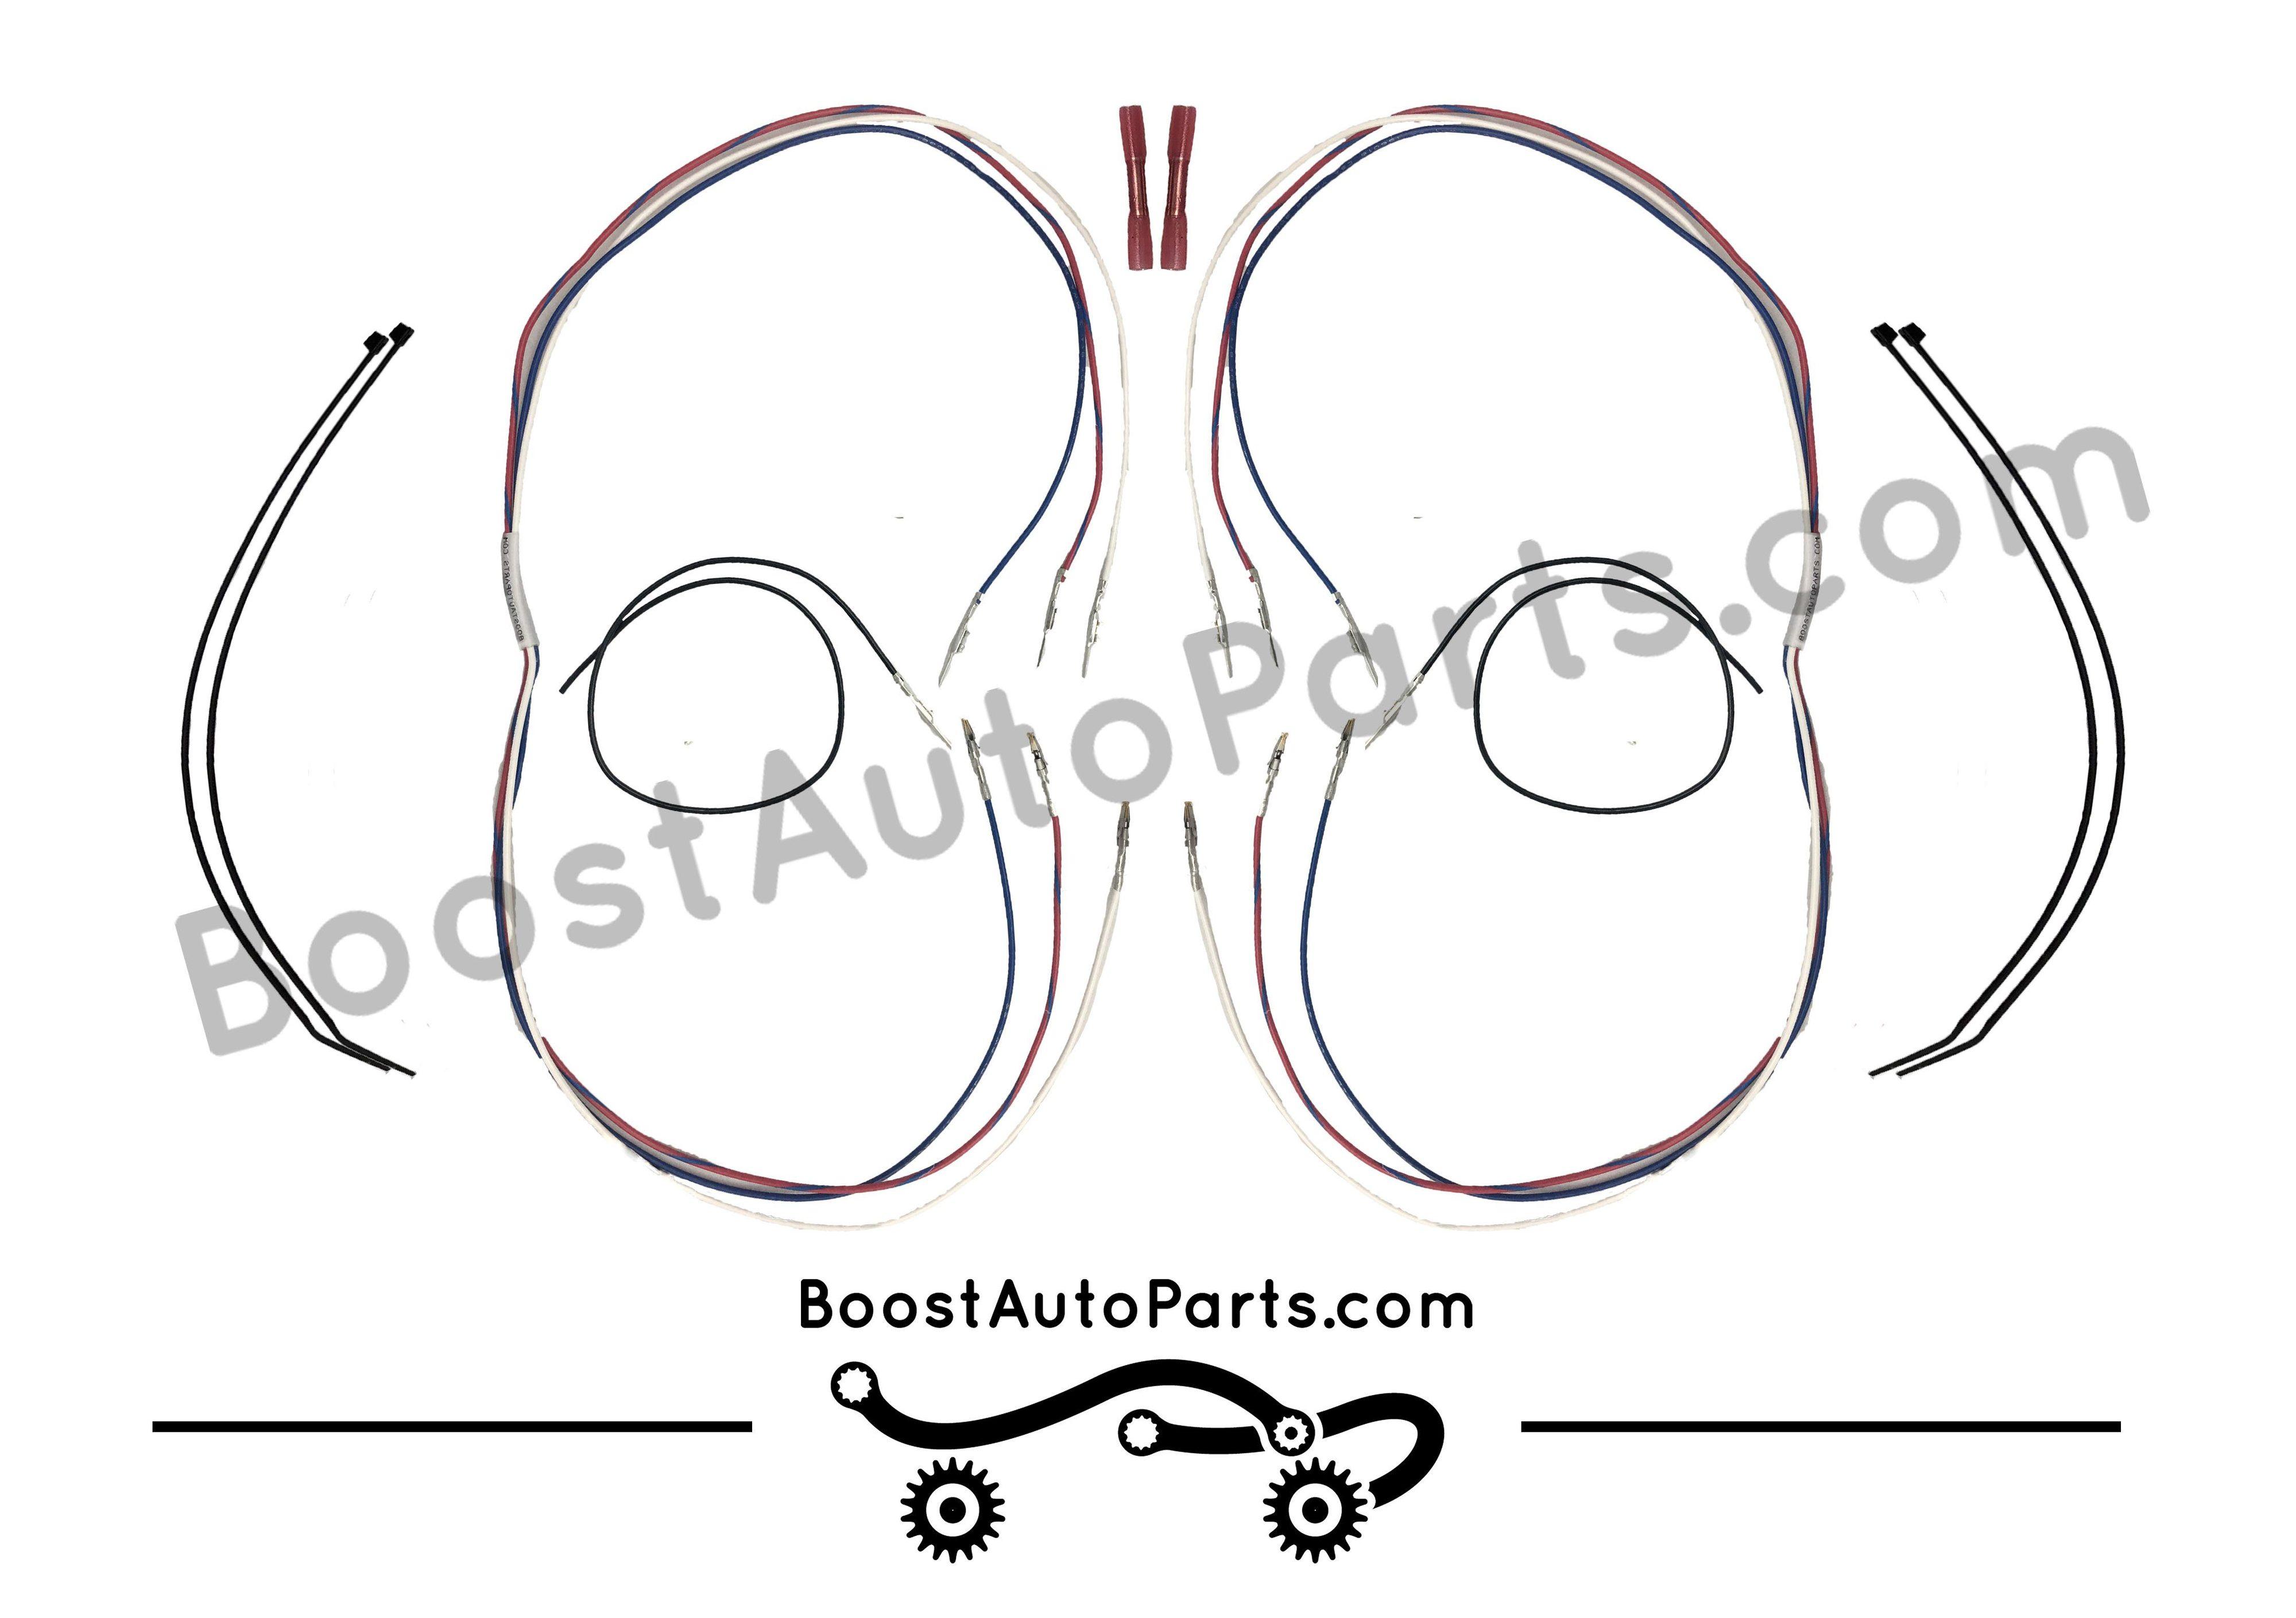 [CZ_2812] Ford Mirror Wiring Harness Oem Schematic Wiring